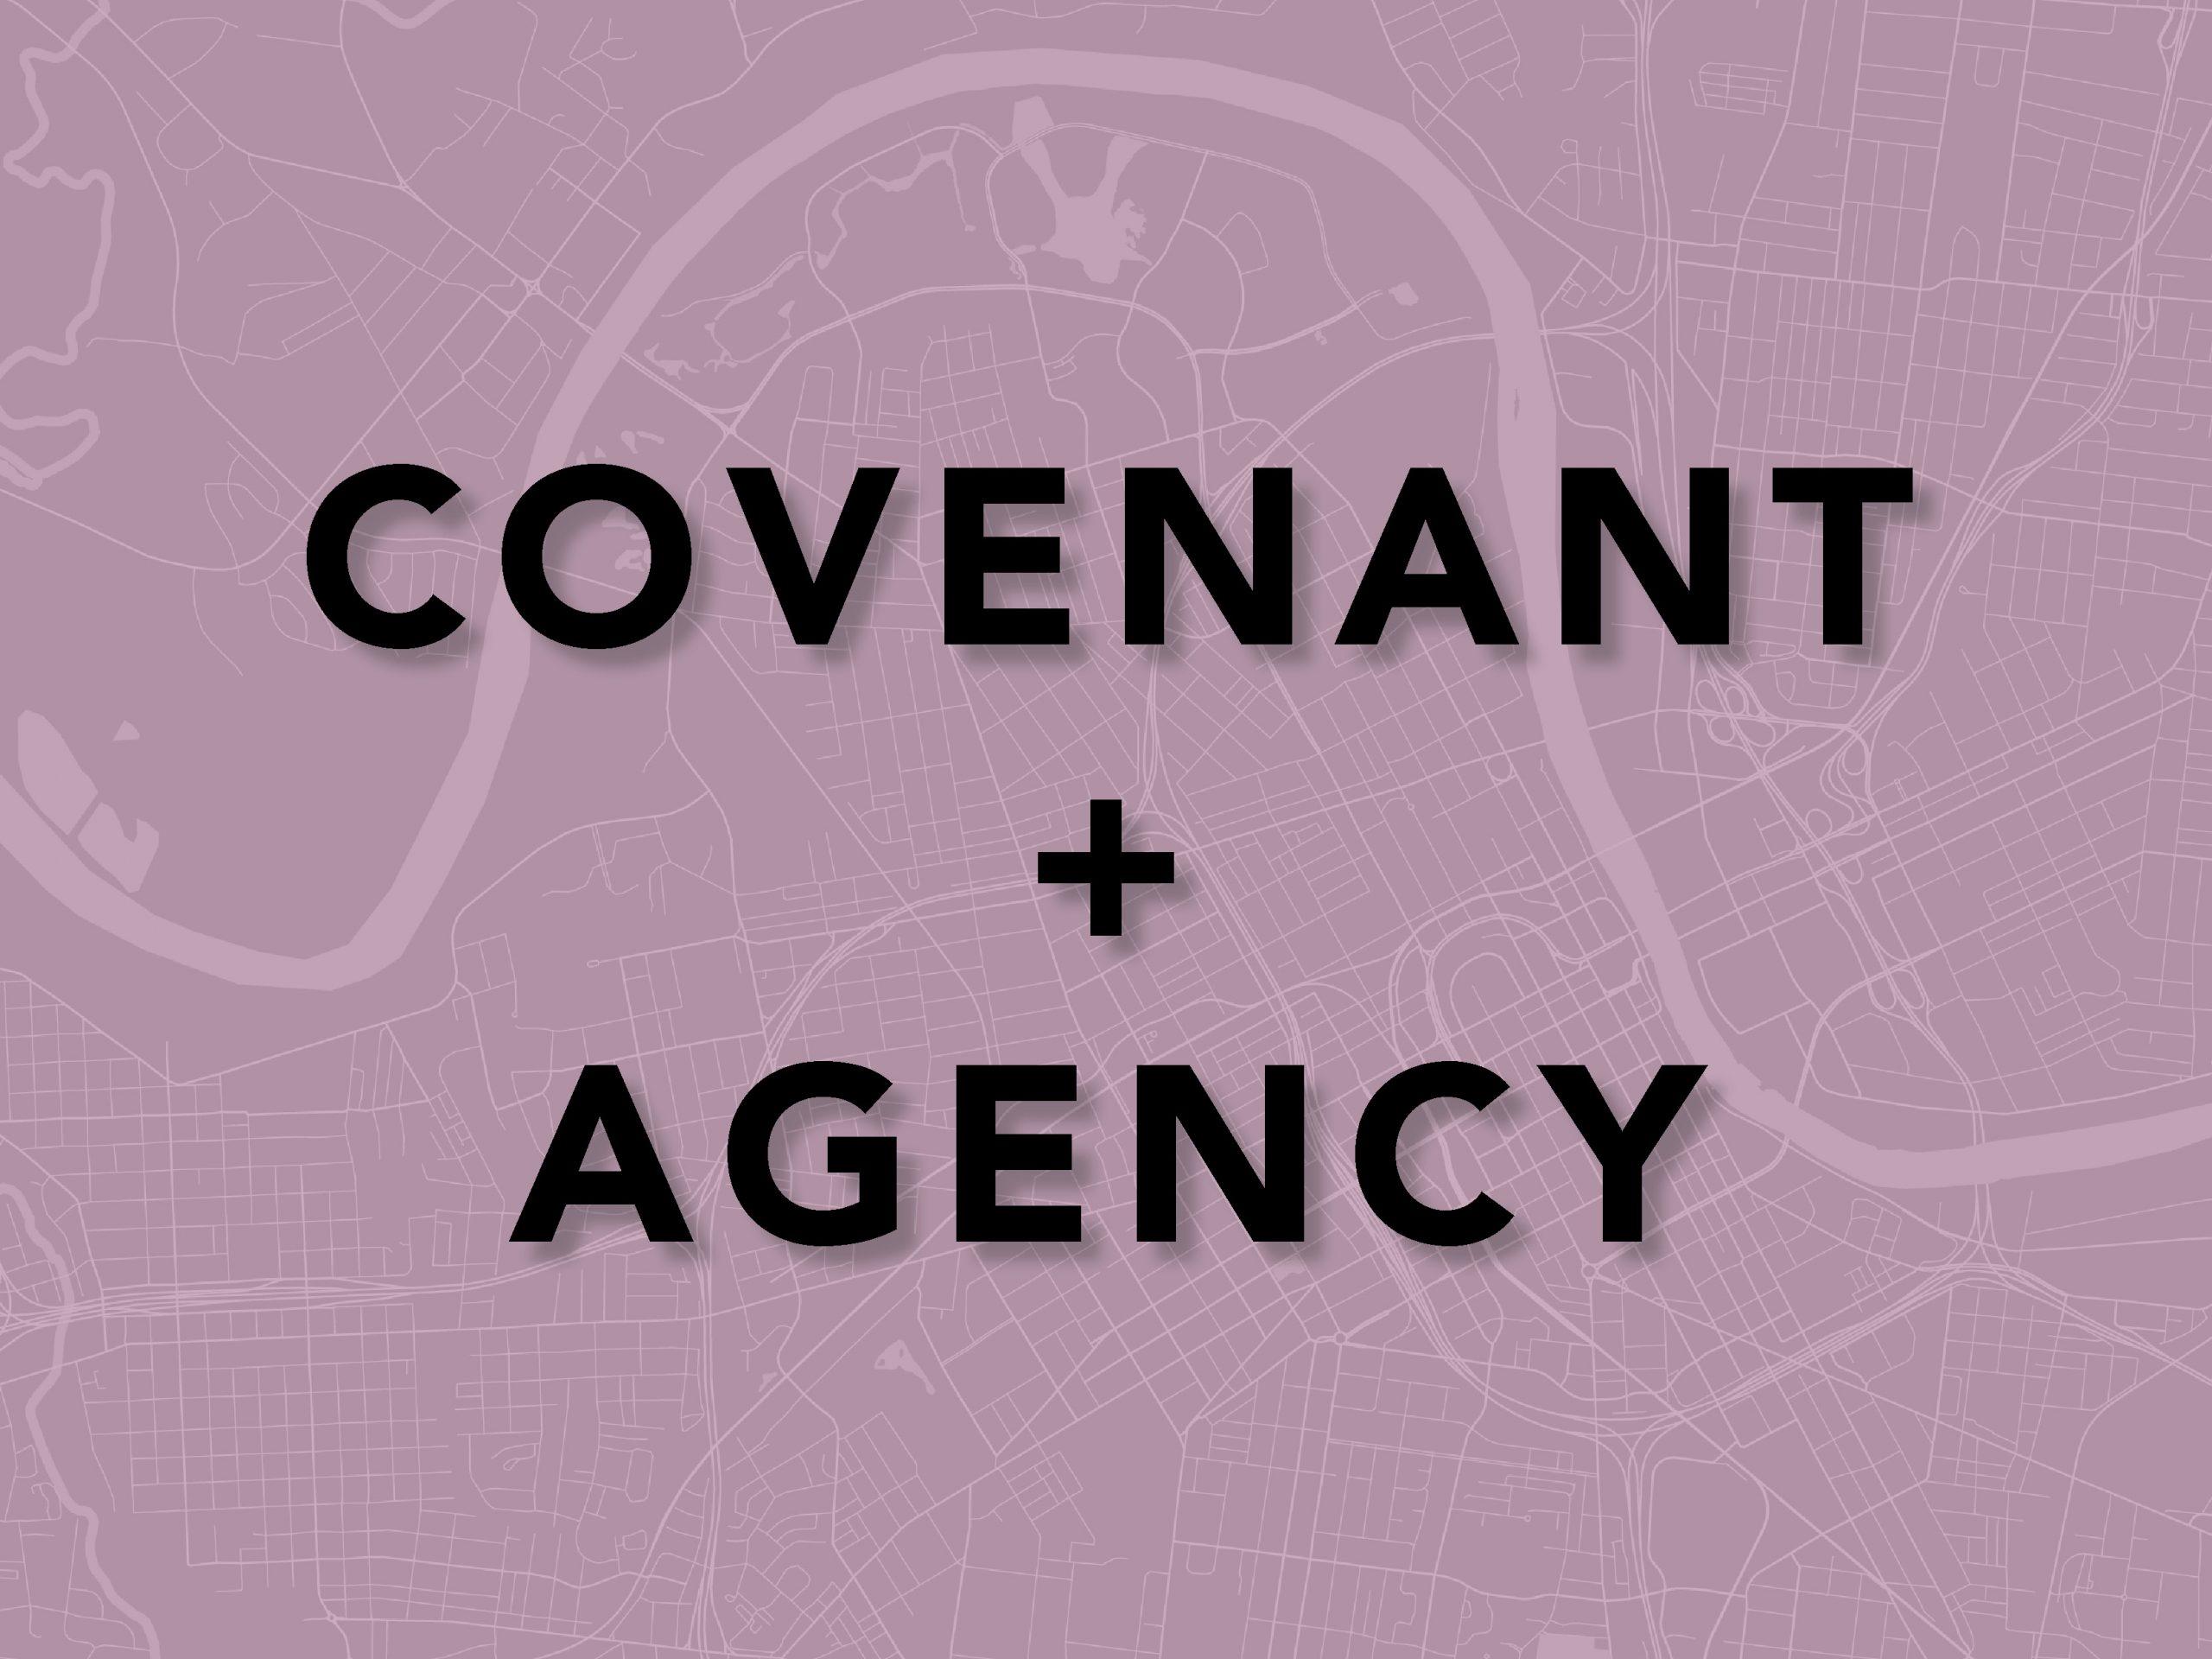 Covenant+Agency